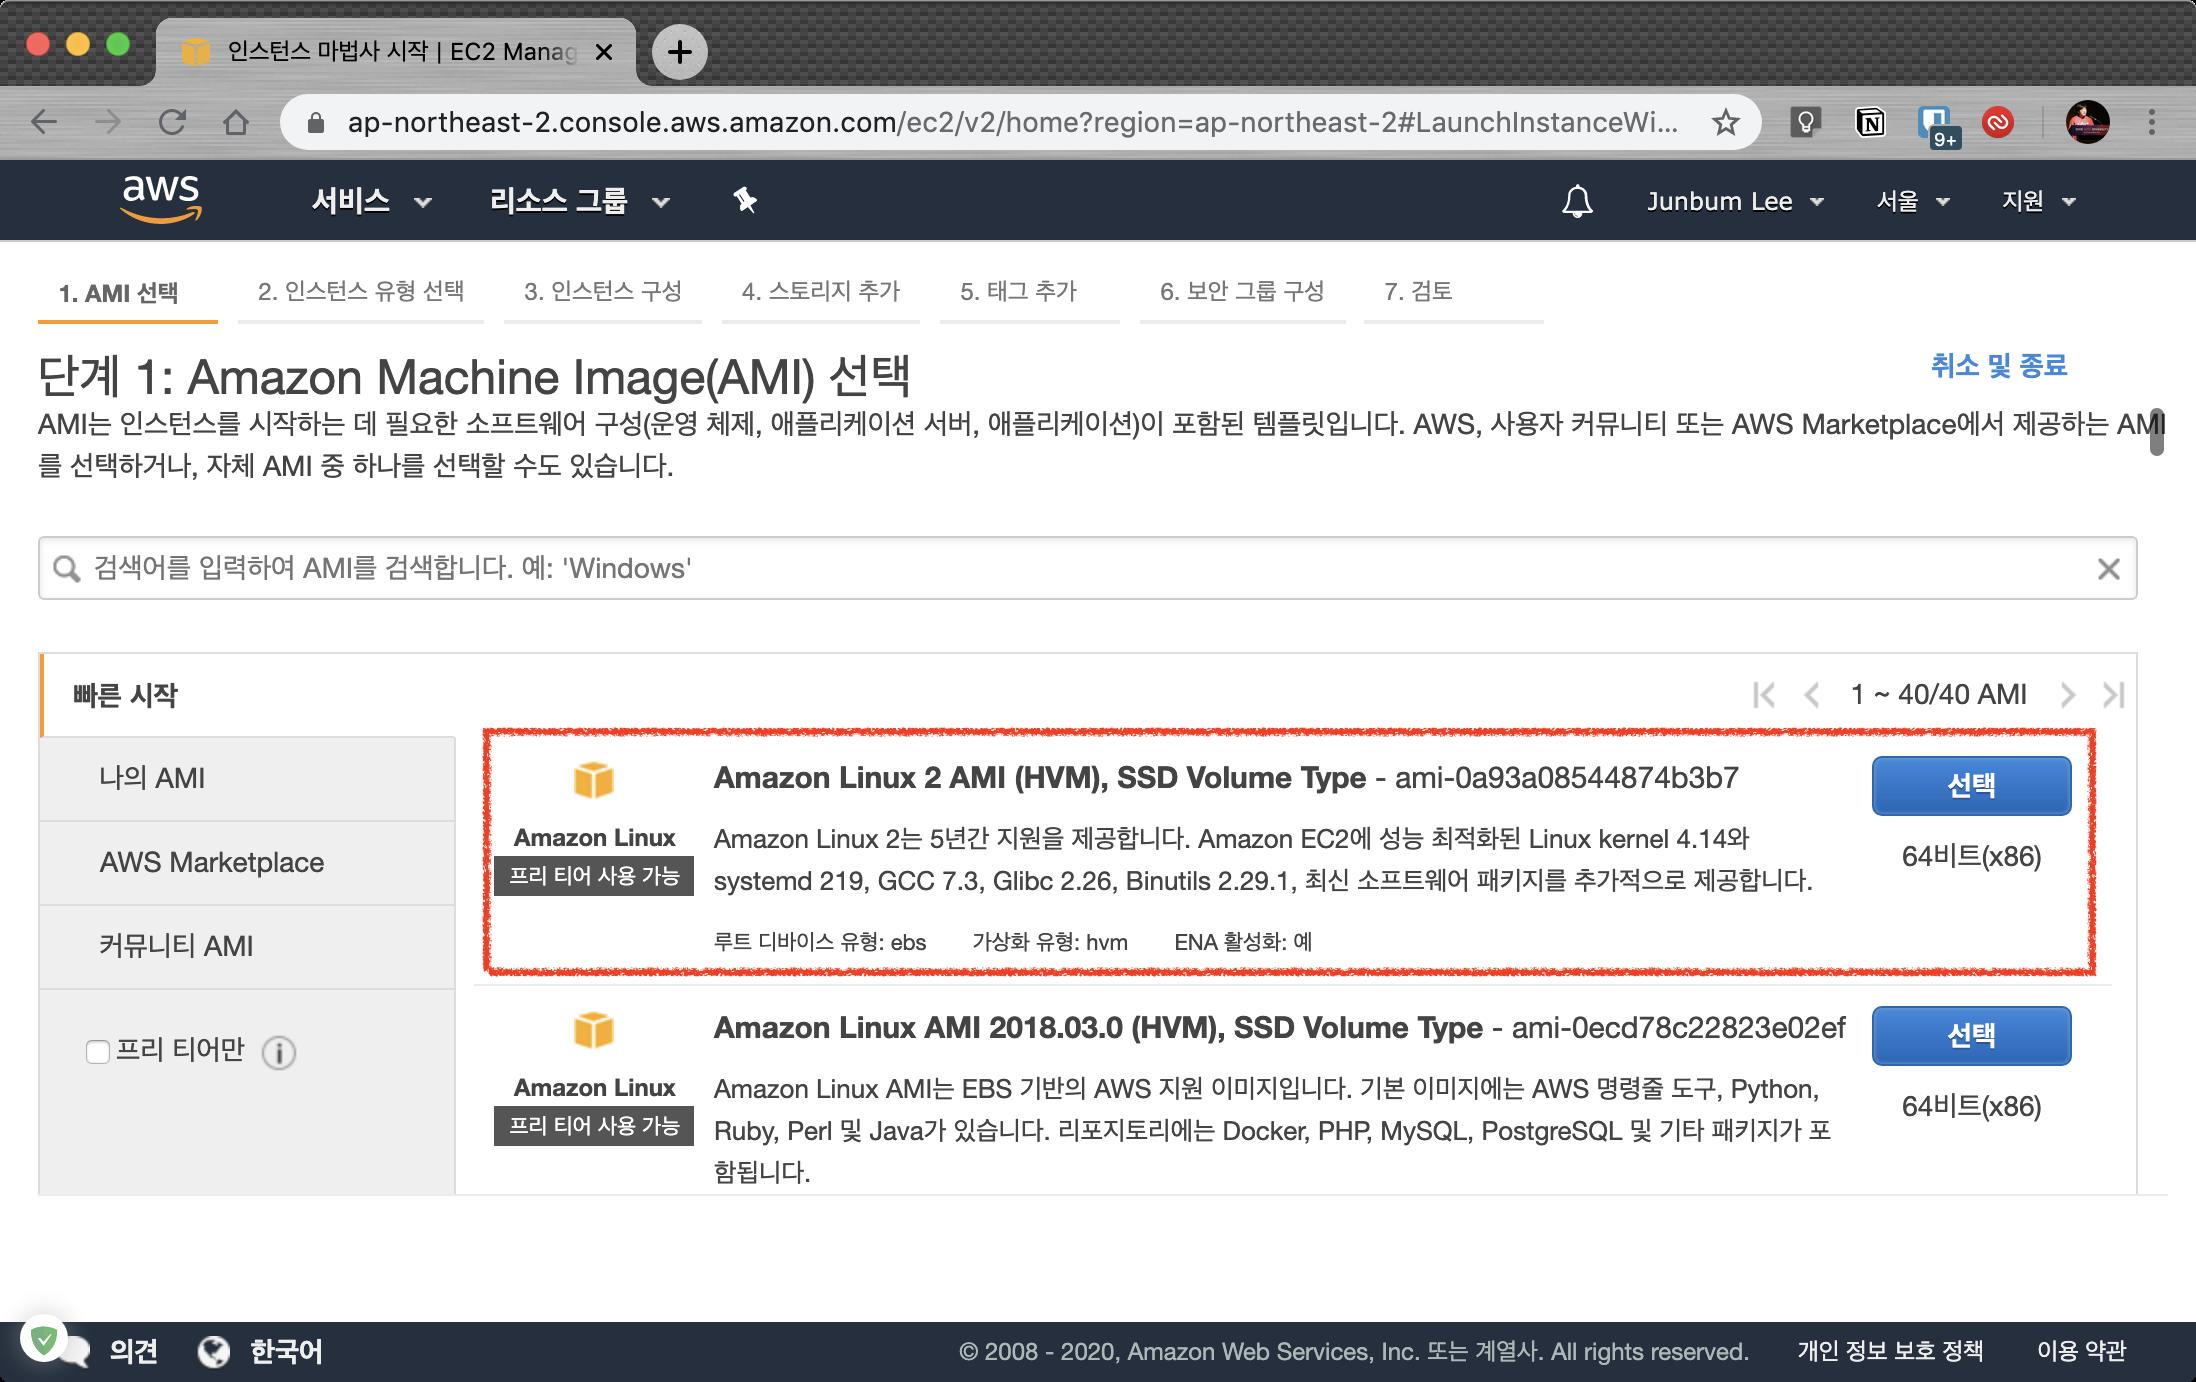 Amazon Linux2 AMI를 이용해 인스턴스 생성하기